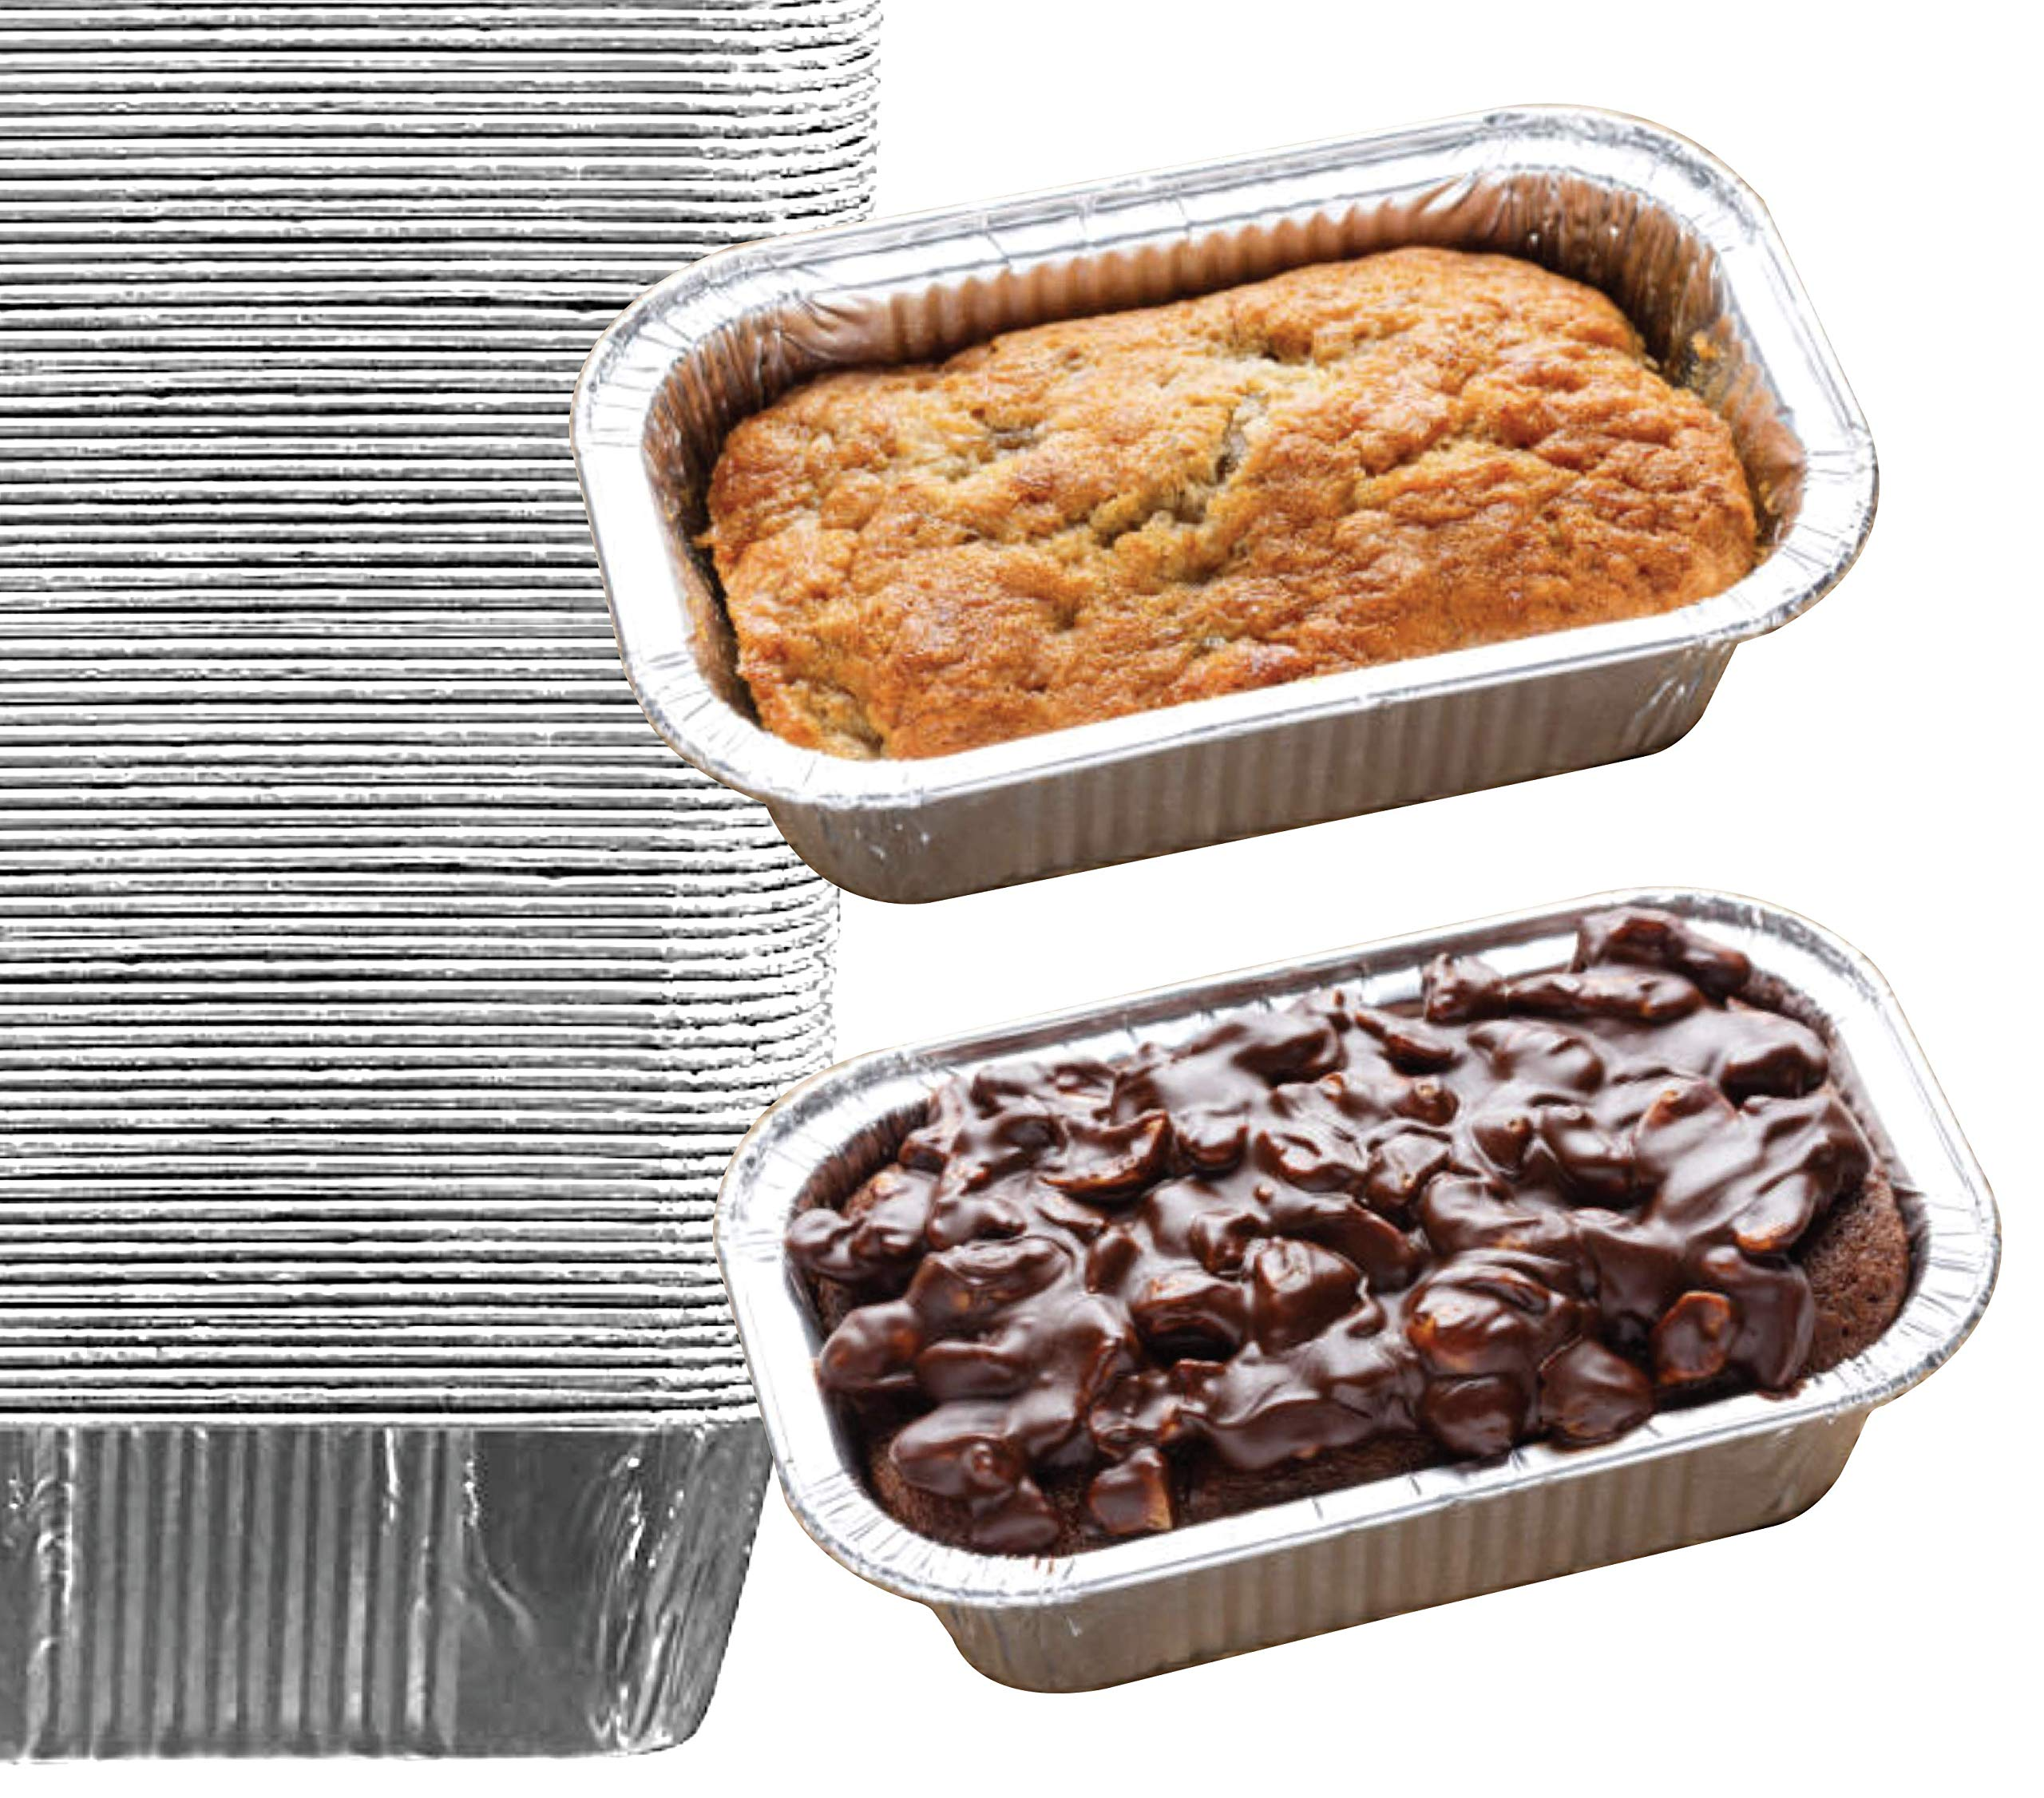 35 Pack - 1LB Sturdy Mini Loaf Pans, Aluminum Loaf Pans, Bread Pans, Foil Loaf Pan l Cake Pan, Disposable Aluminum Pans l Top bakery's choice Tin Pans - 1 Pound - 6'' X 3.5'' x 2'' by Spare Essentials